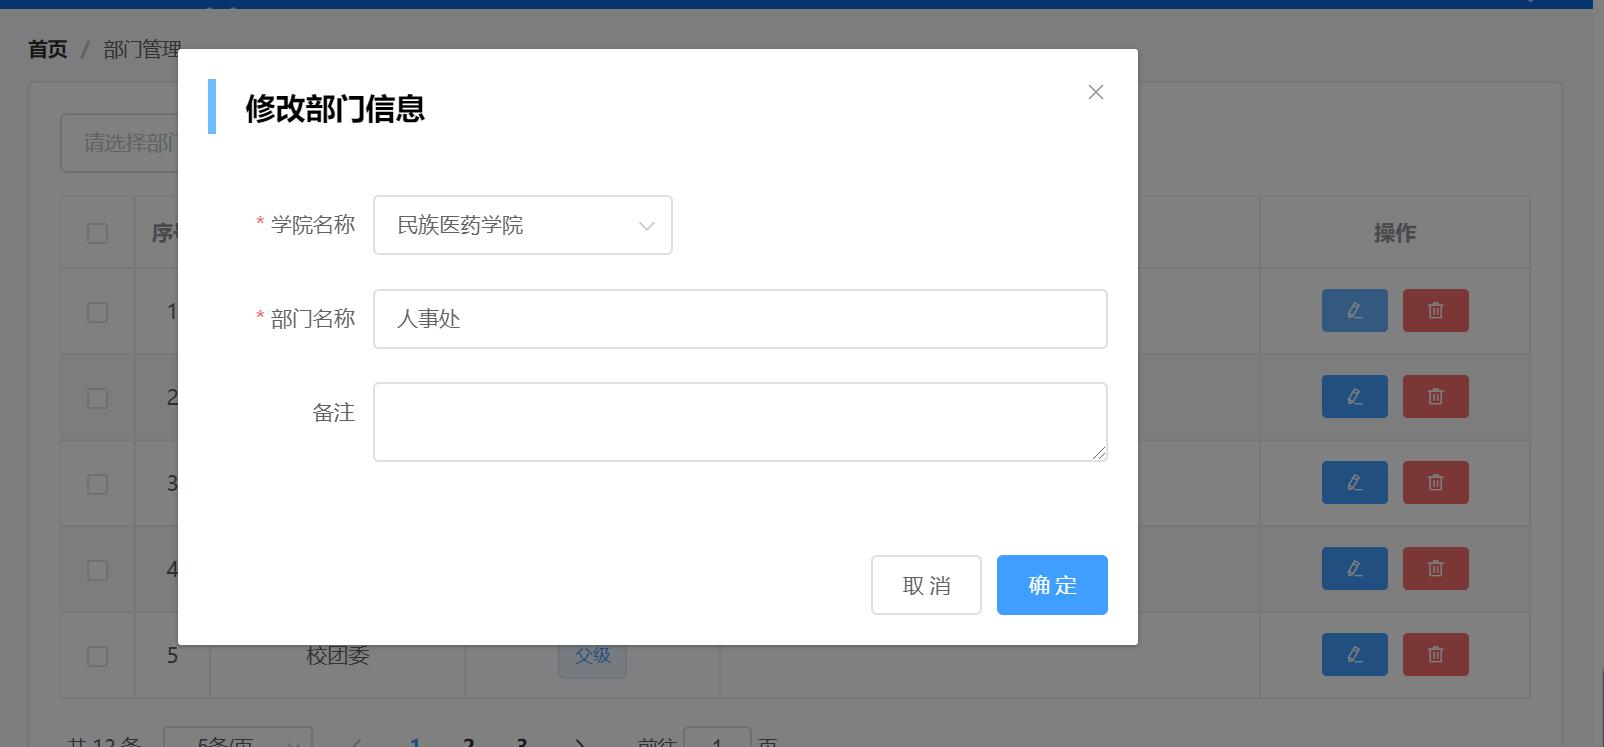 ElementUI 基于vue+sortable.js实现表格行拖拽  vue和element实现增删改查